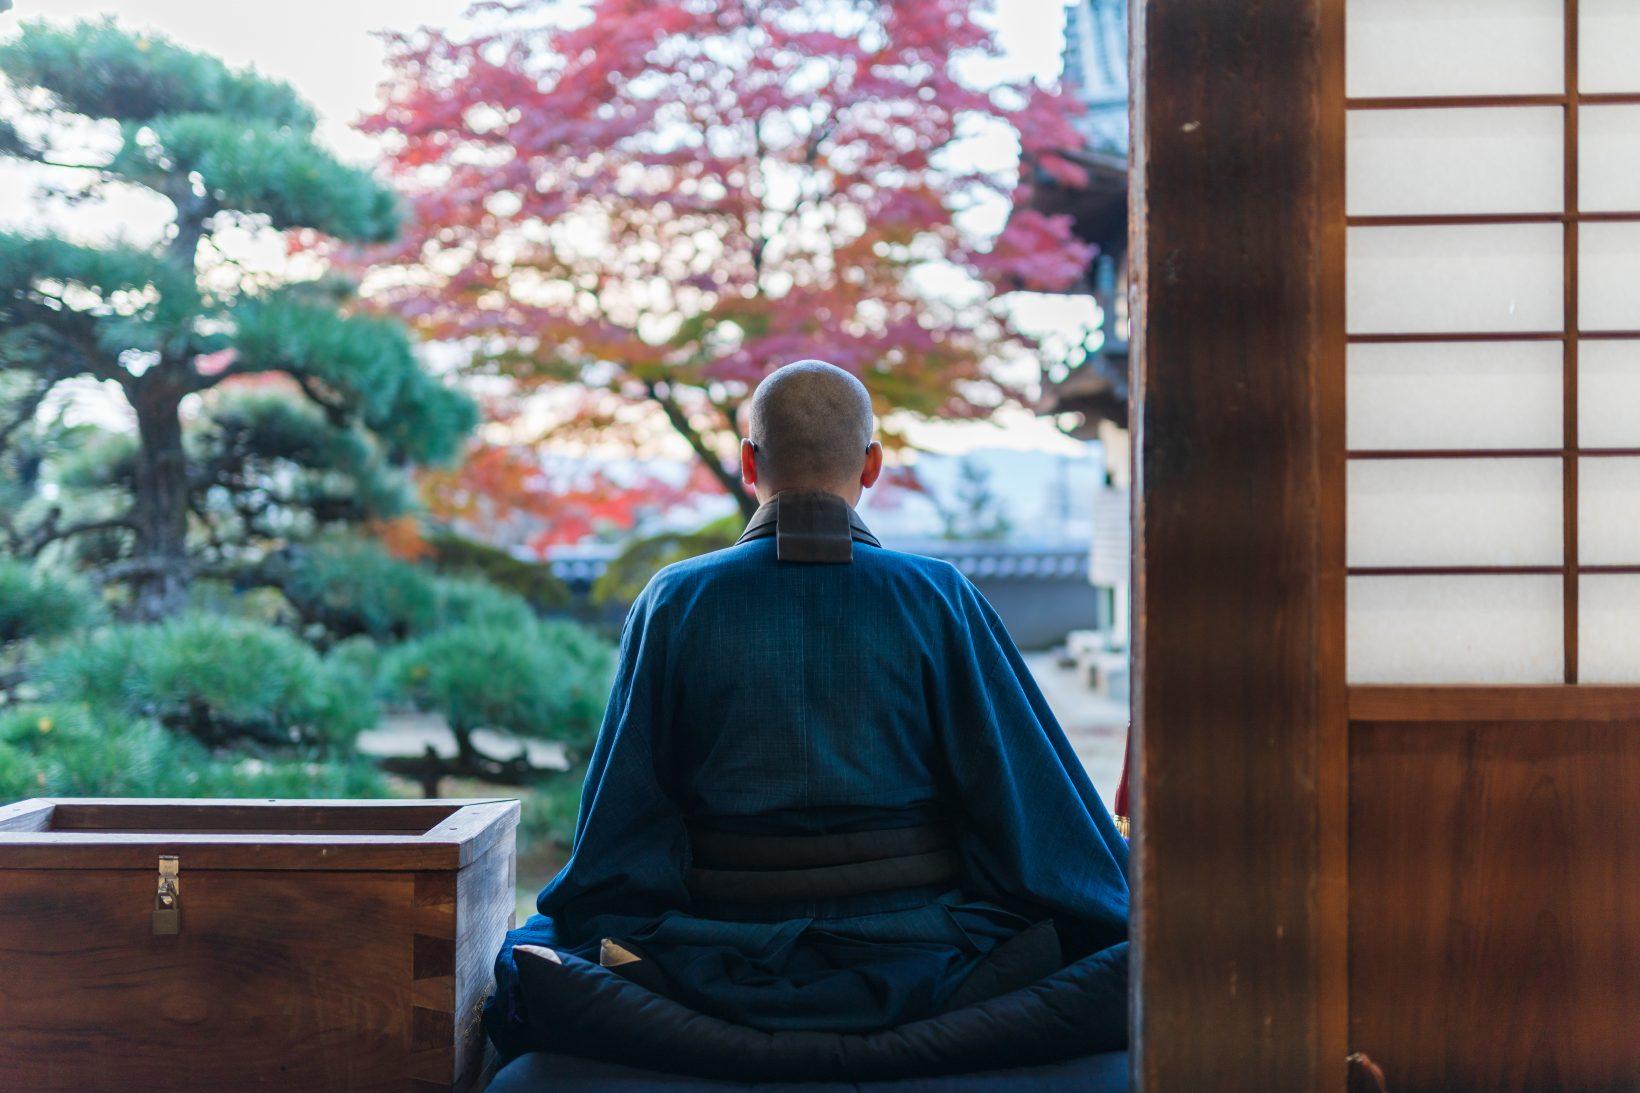 Shōjin-ryōri: Buddhist monks' cuisine inspires the greatest chefs